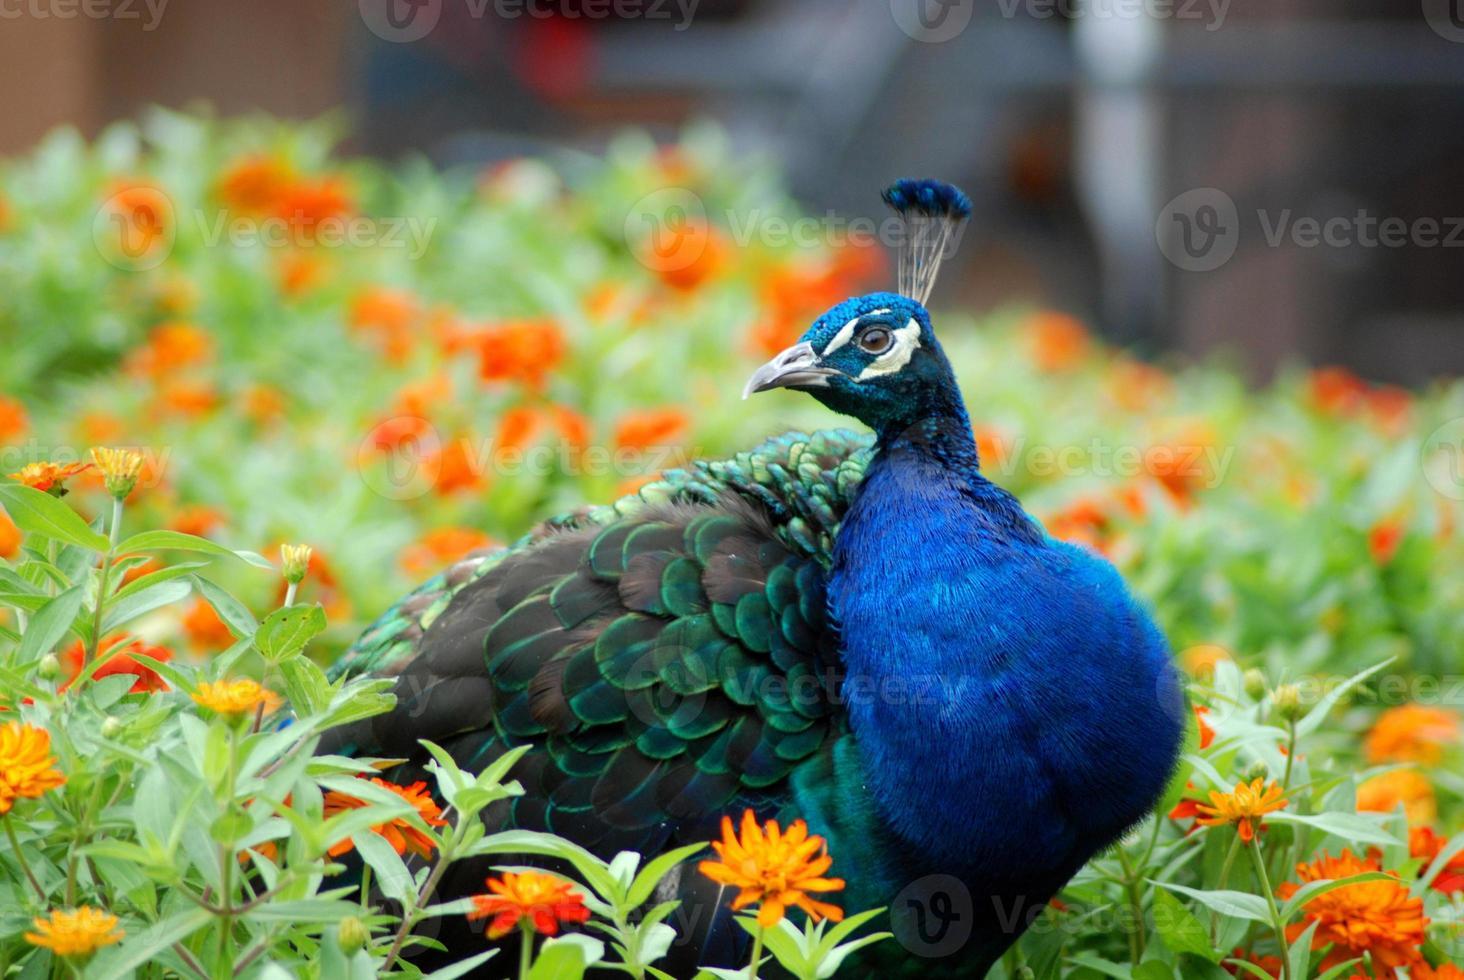 Peacock in a field of orange flowers photo